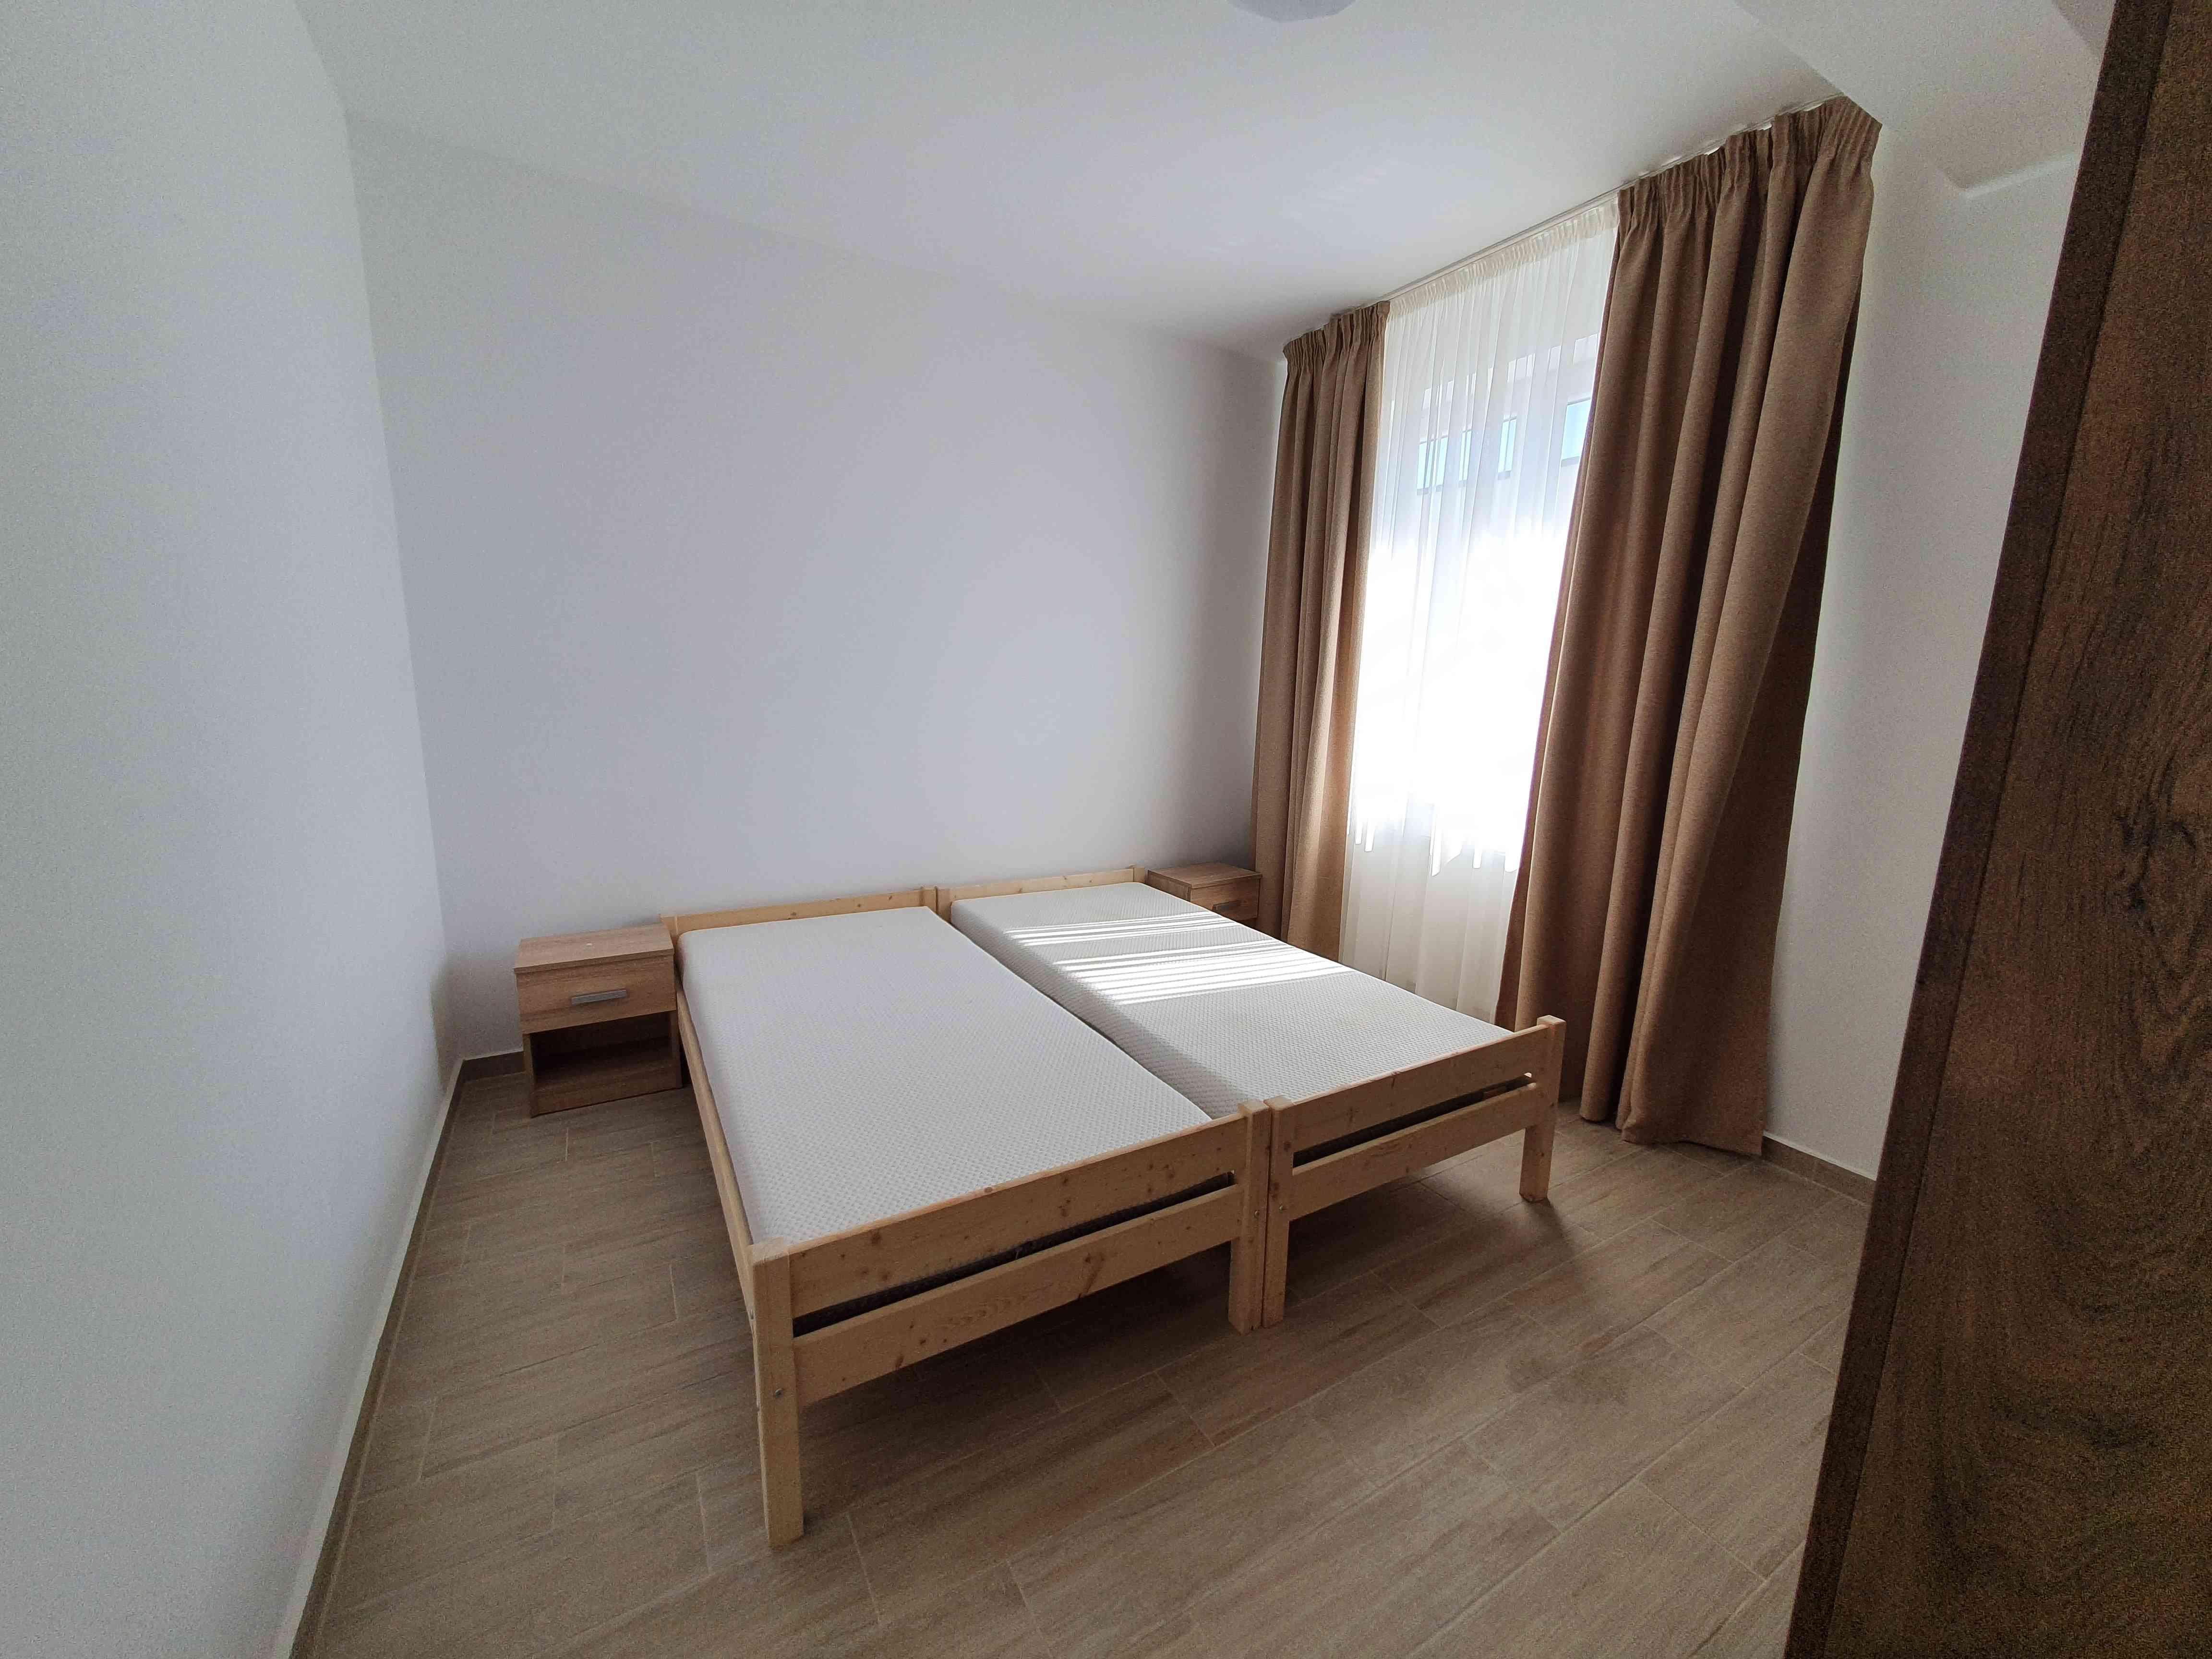 Inchiriere Apartament 2 Camere decomandat Ghimbav